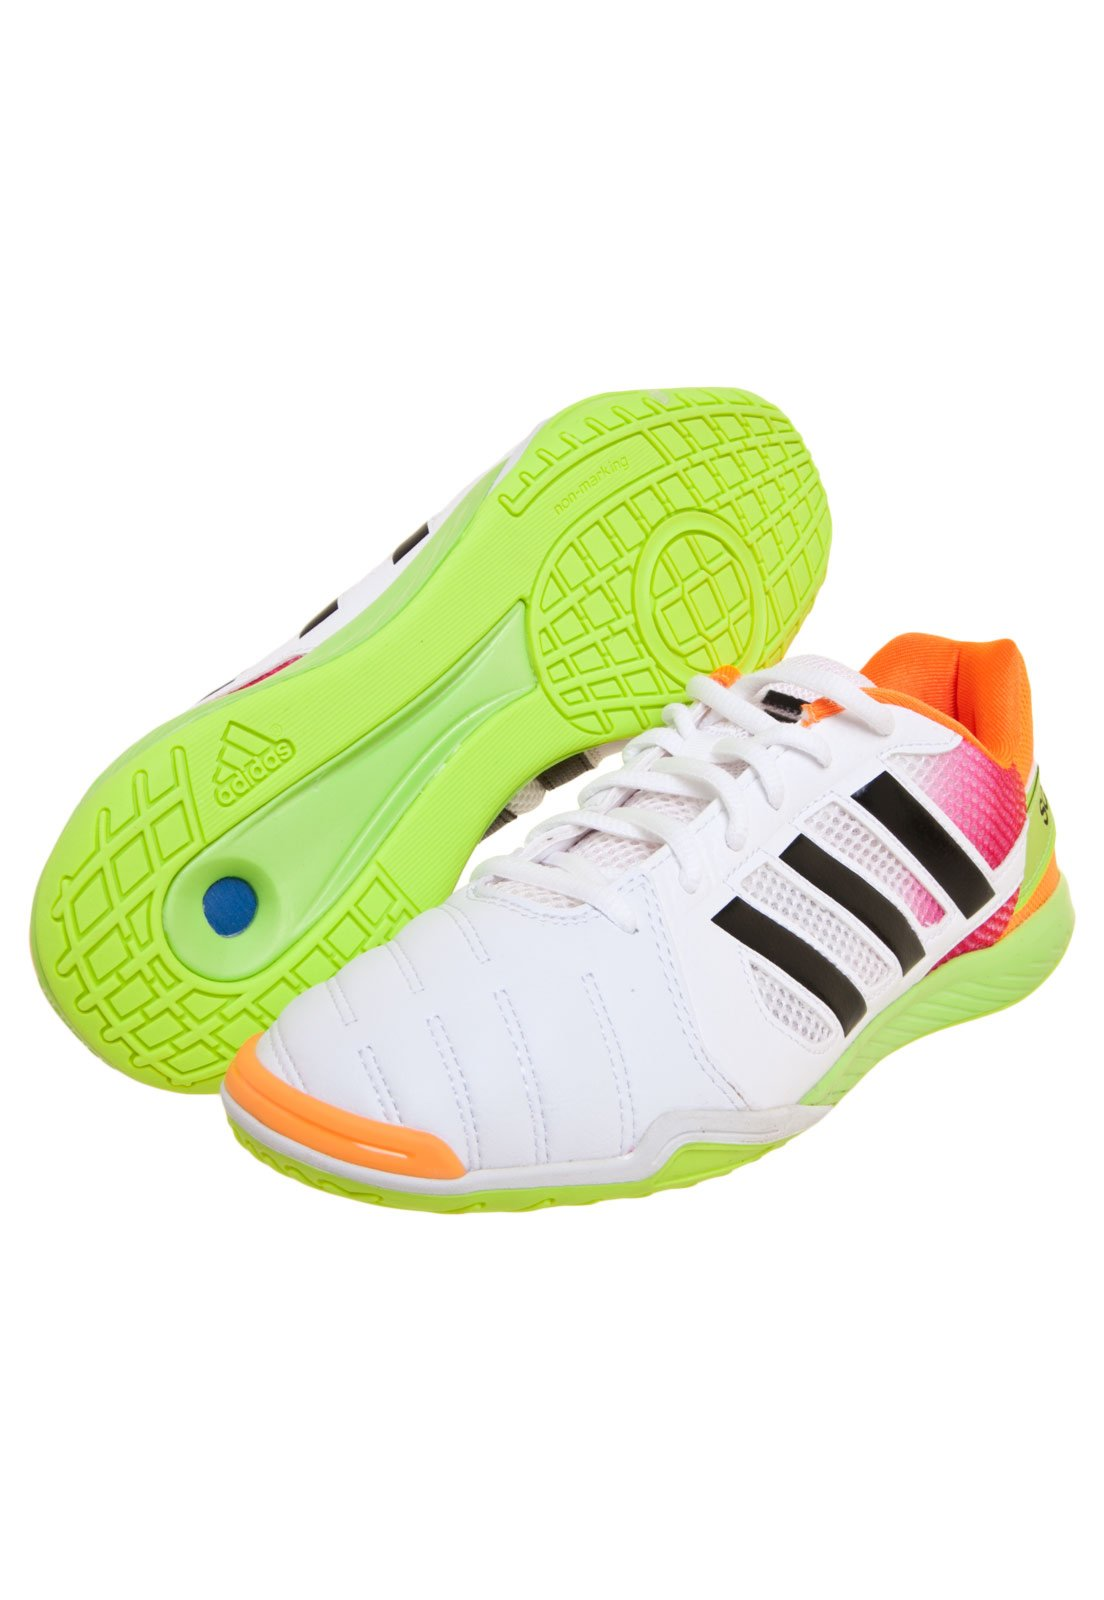 Yükle (1104x1600)Chuteira Compre Futsal adidas Branco FreeFootball TopSala  Branco 13751 Compre Agora c7415d2 - avtoshkola7.onlineChuteira Compre Futsal  ... b826c482a04f7